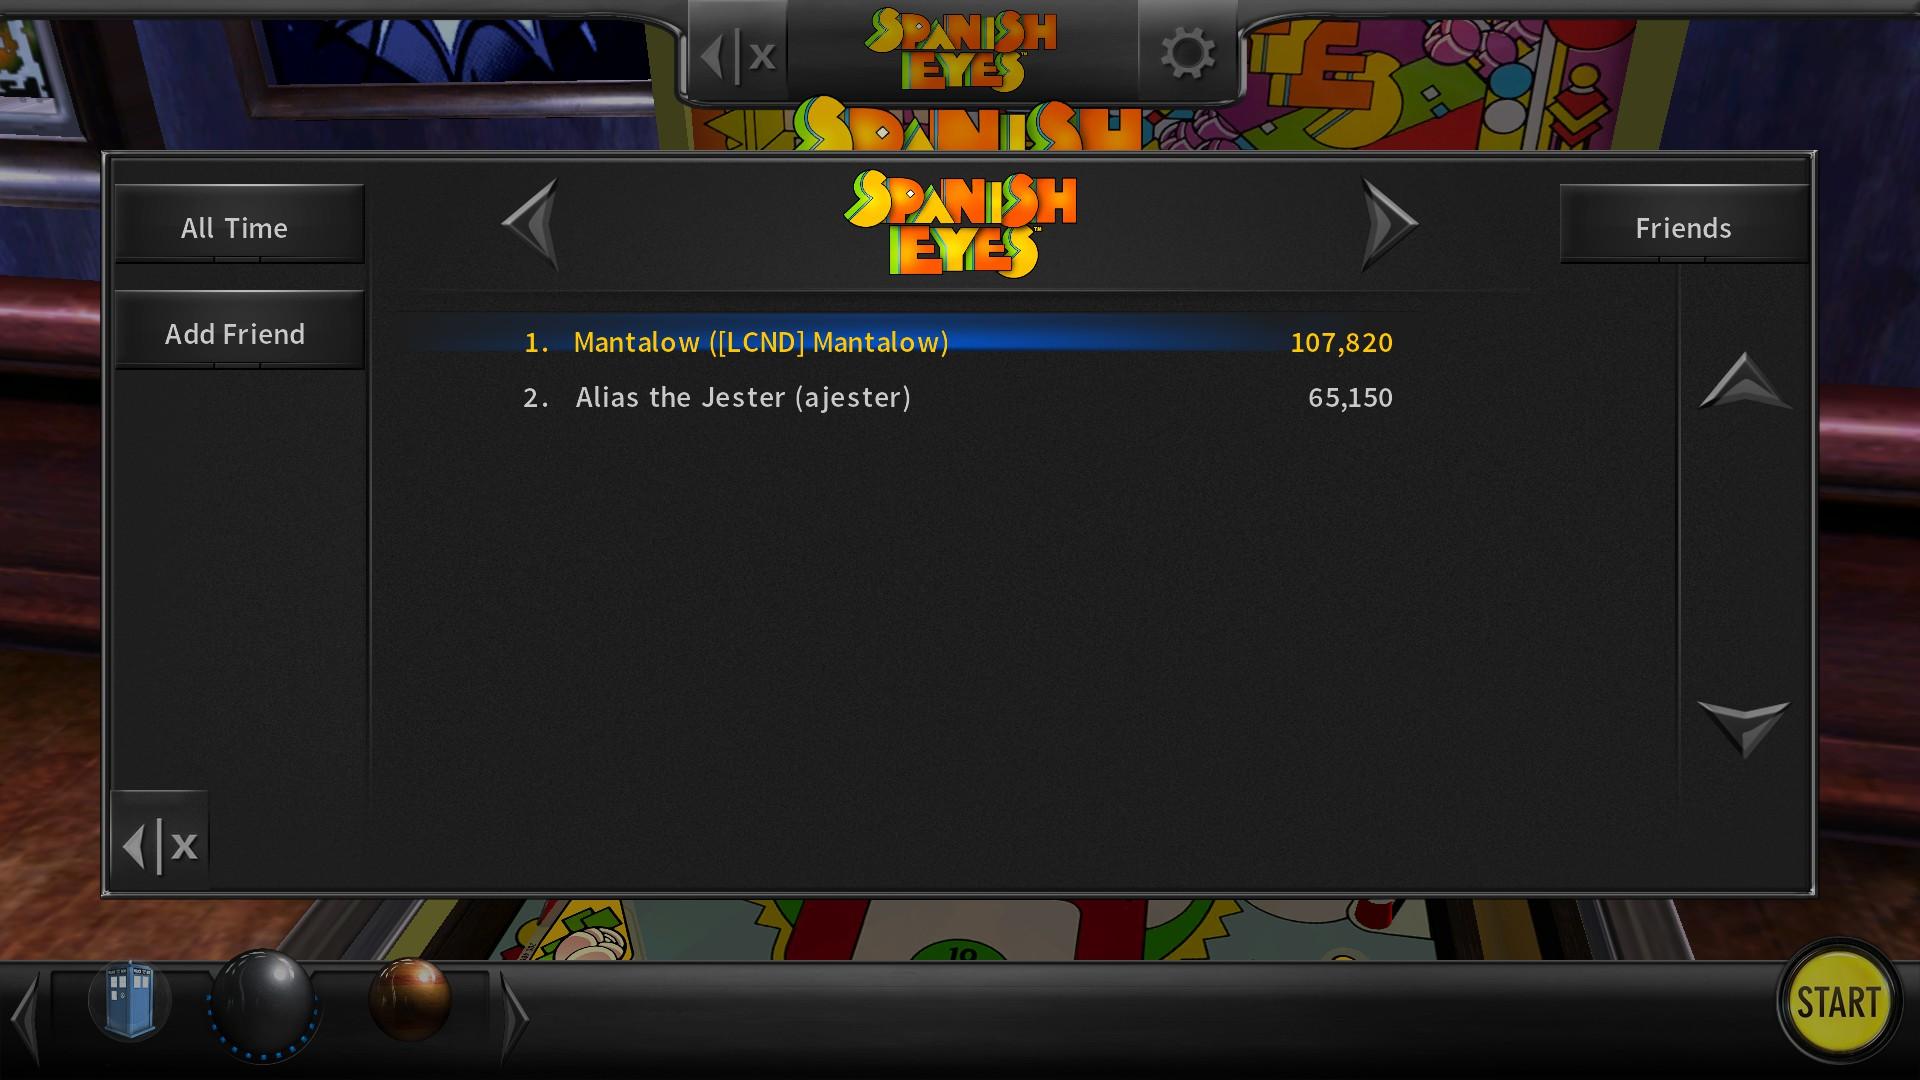 Mantalow: Pinball Arcade: Spanish Eyes (PC) 107,820 points on 2018-01-16 03:04:19